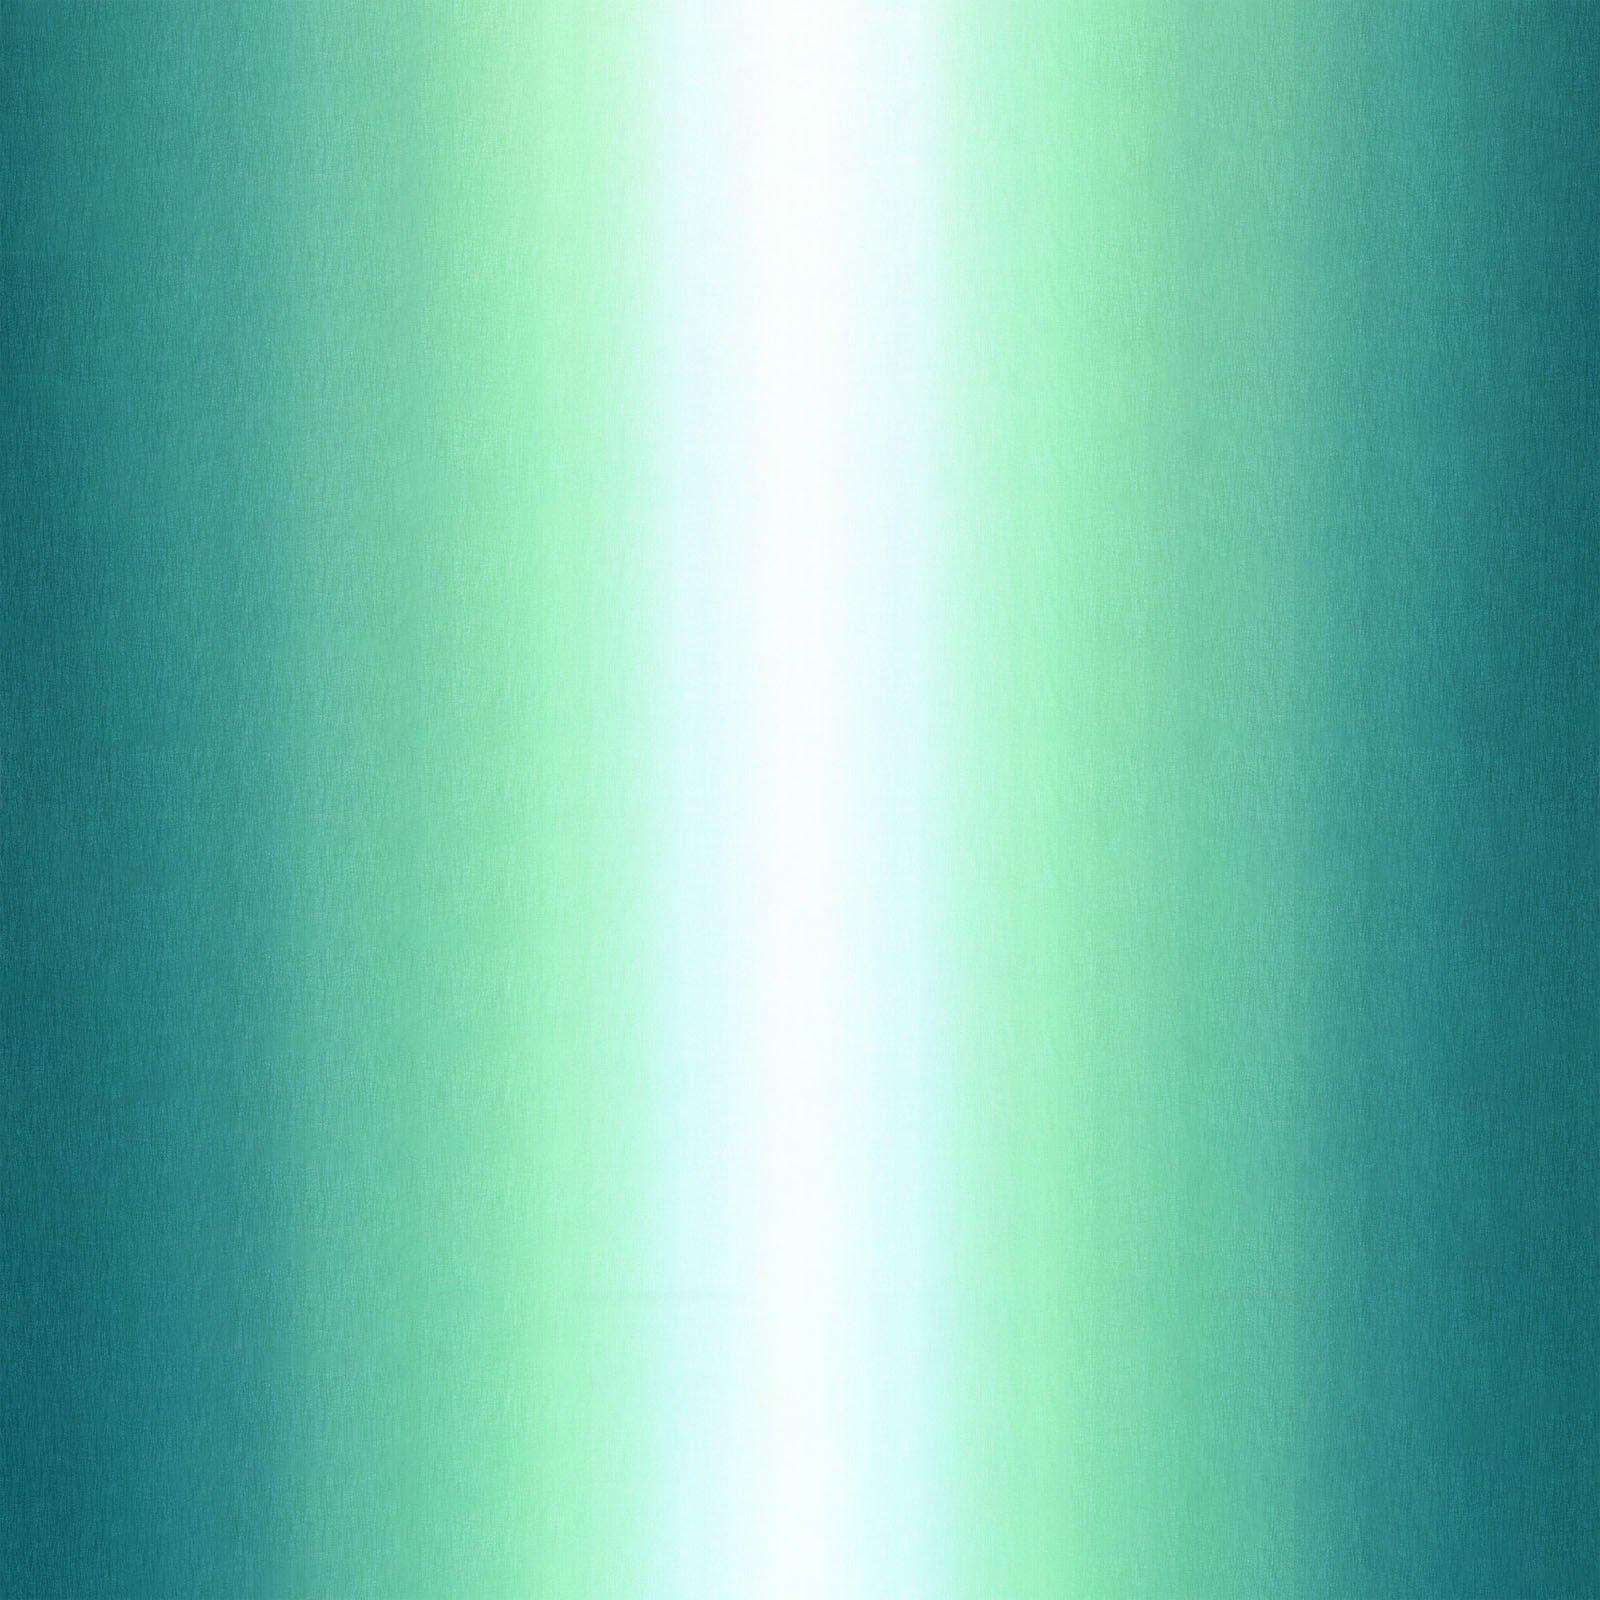 Green Teal Tonal Multi Gelato Ombre